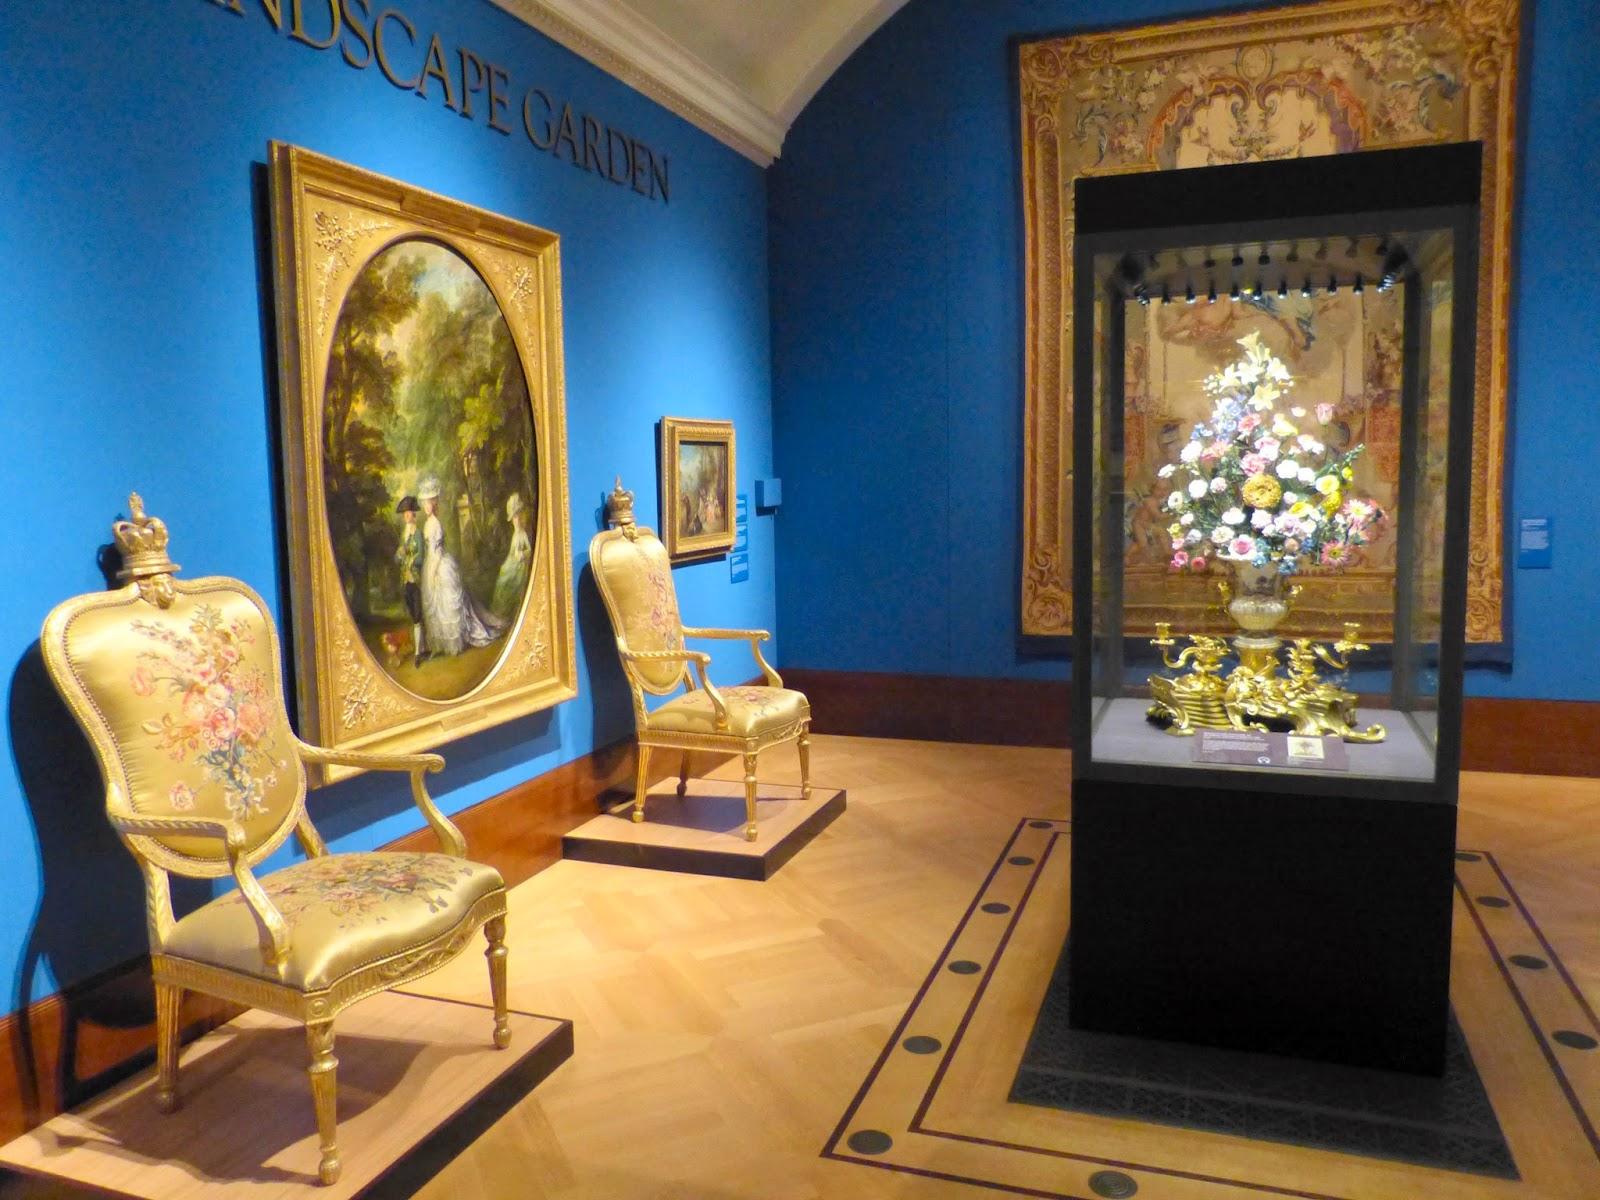 The fiirst Landscape Garden exhibition room